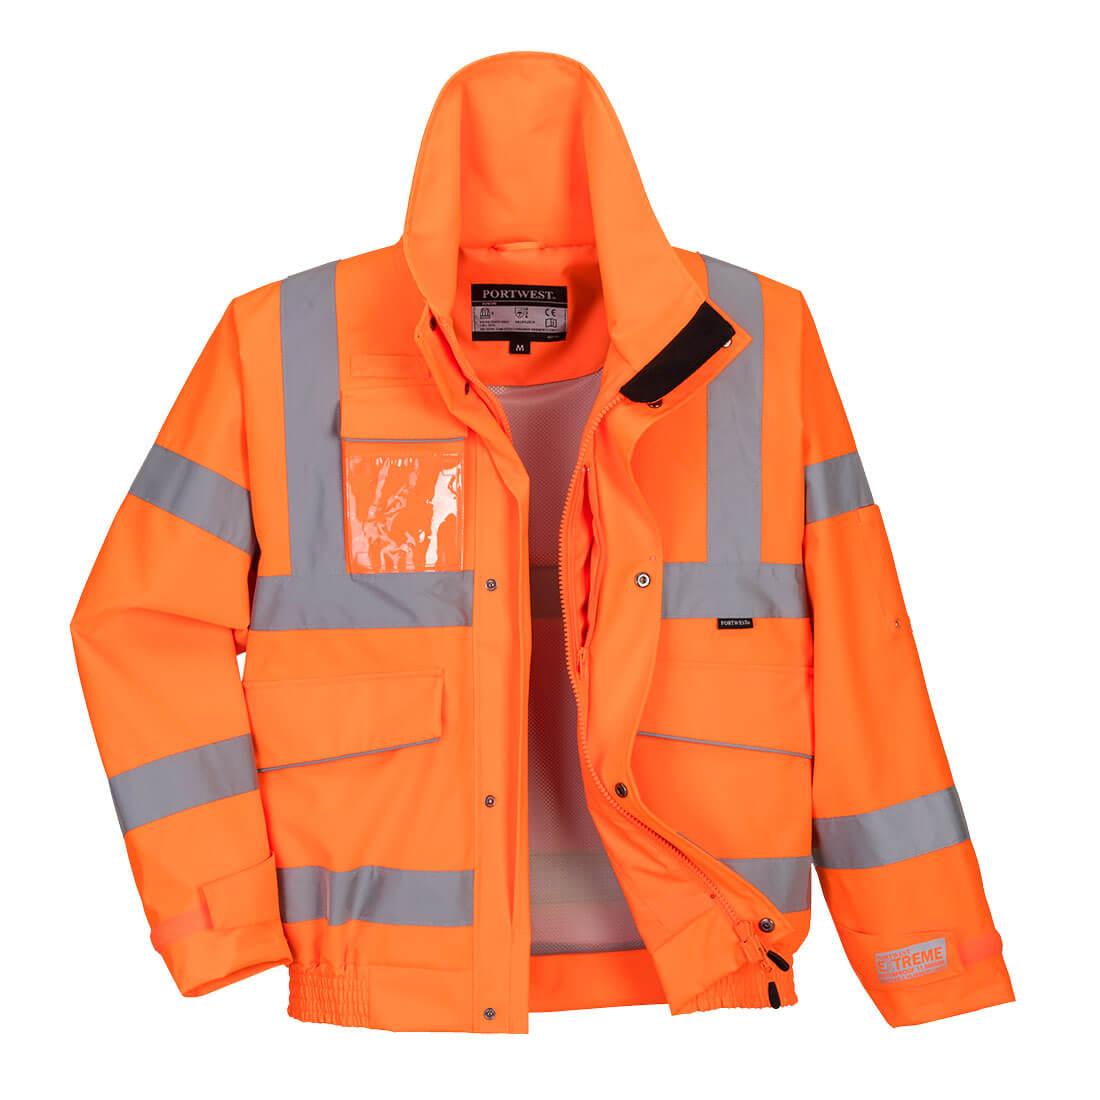 Portwest Bomber Jacket